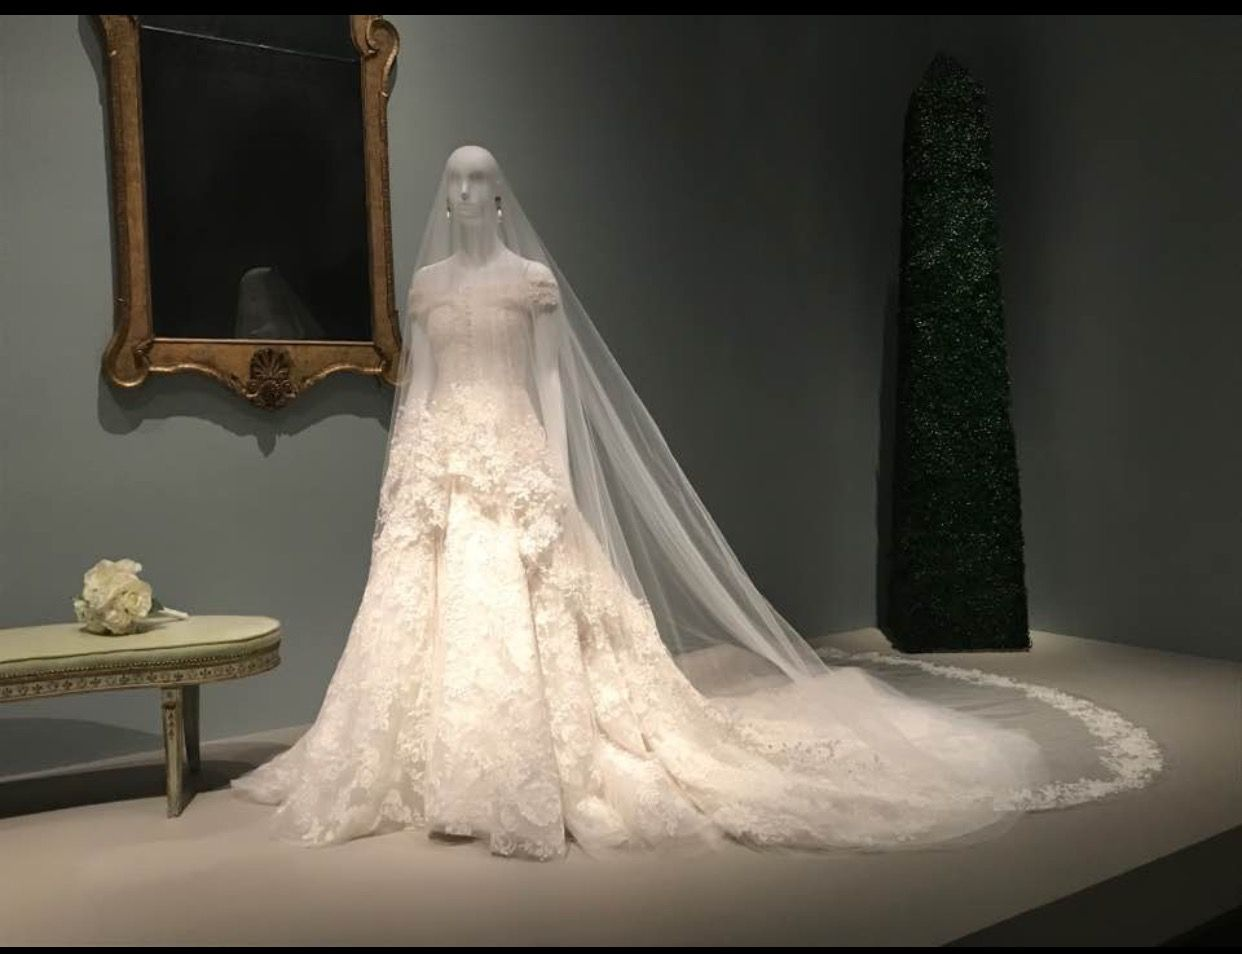 The wedding dress of Amal Alamuddin now